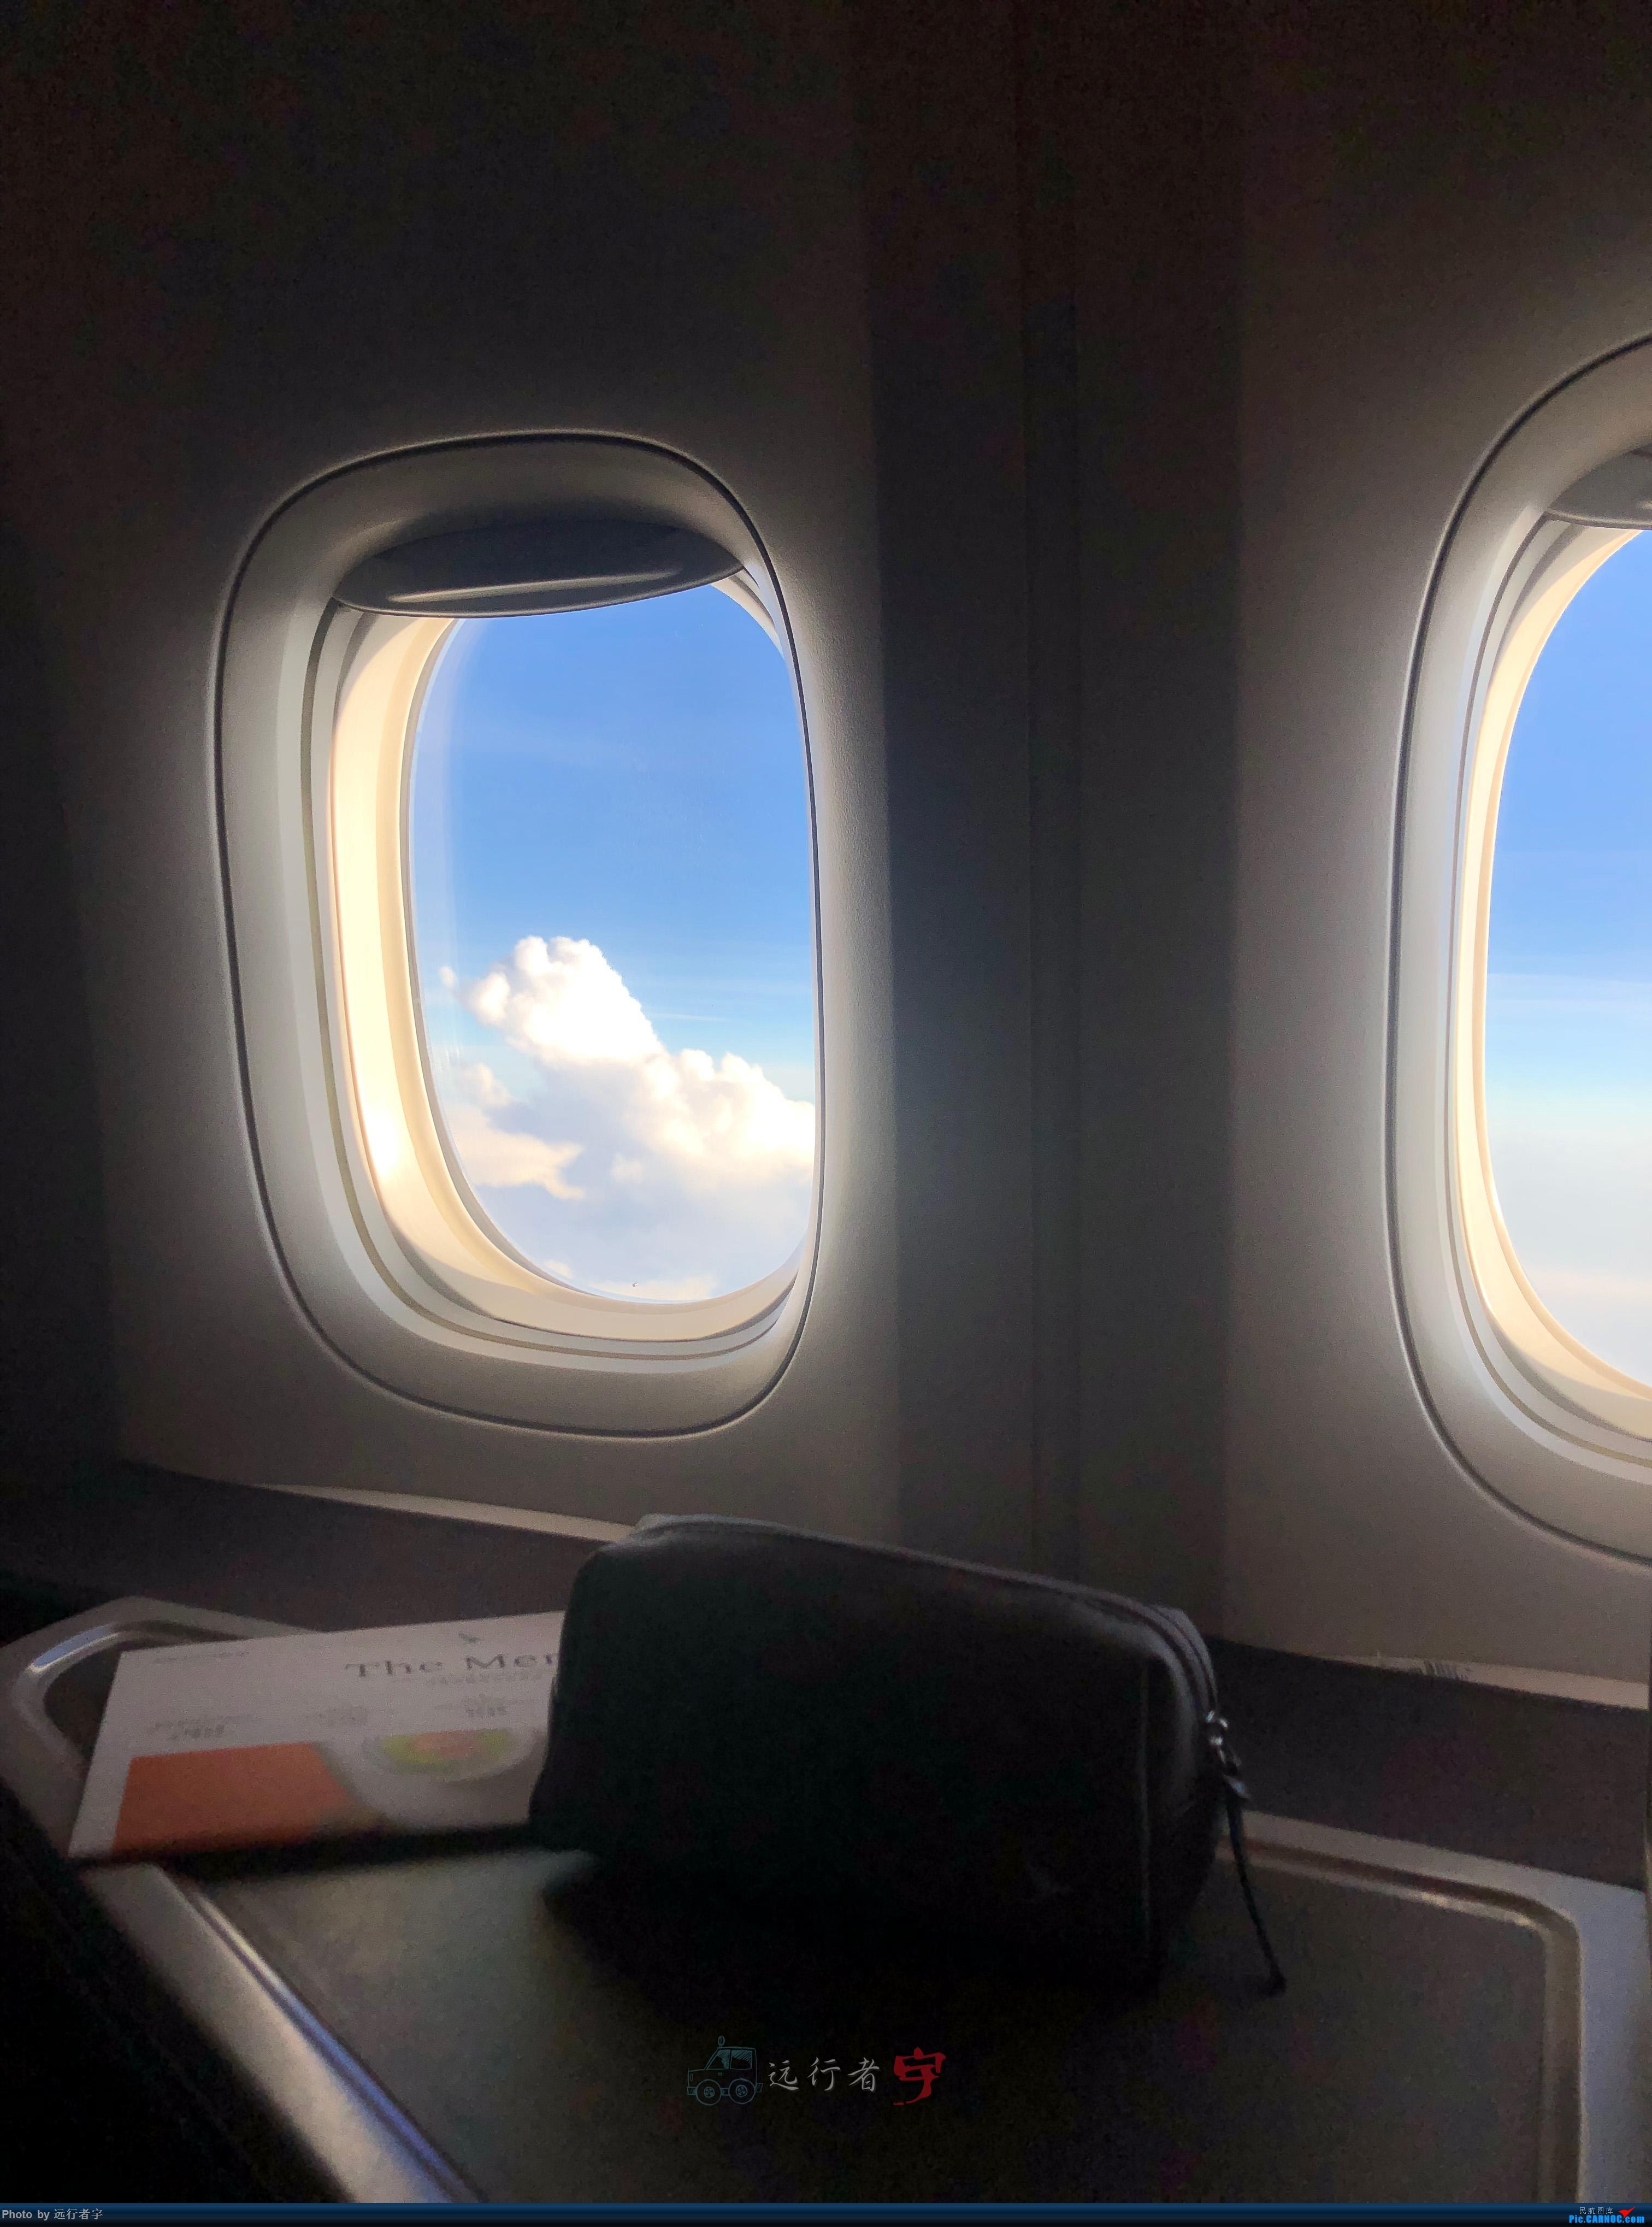 Re:国泰航空HKG-SFO LAX-HKG 公务舱 A350 B777 BOEING 777-300 B-HLB 空中